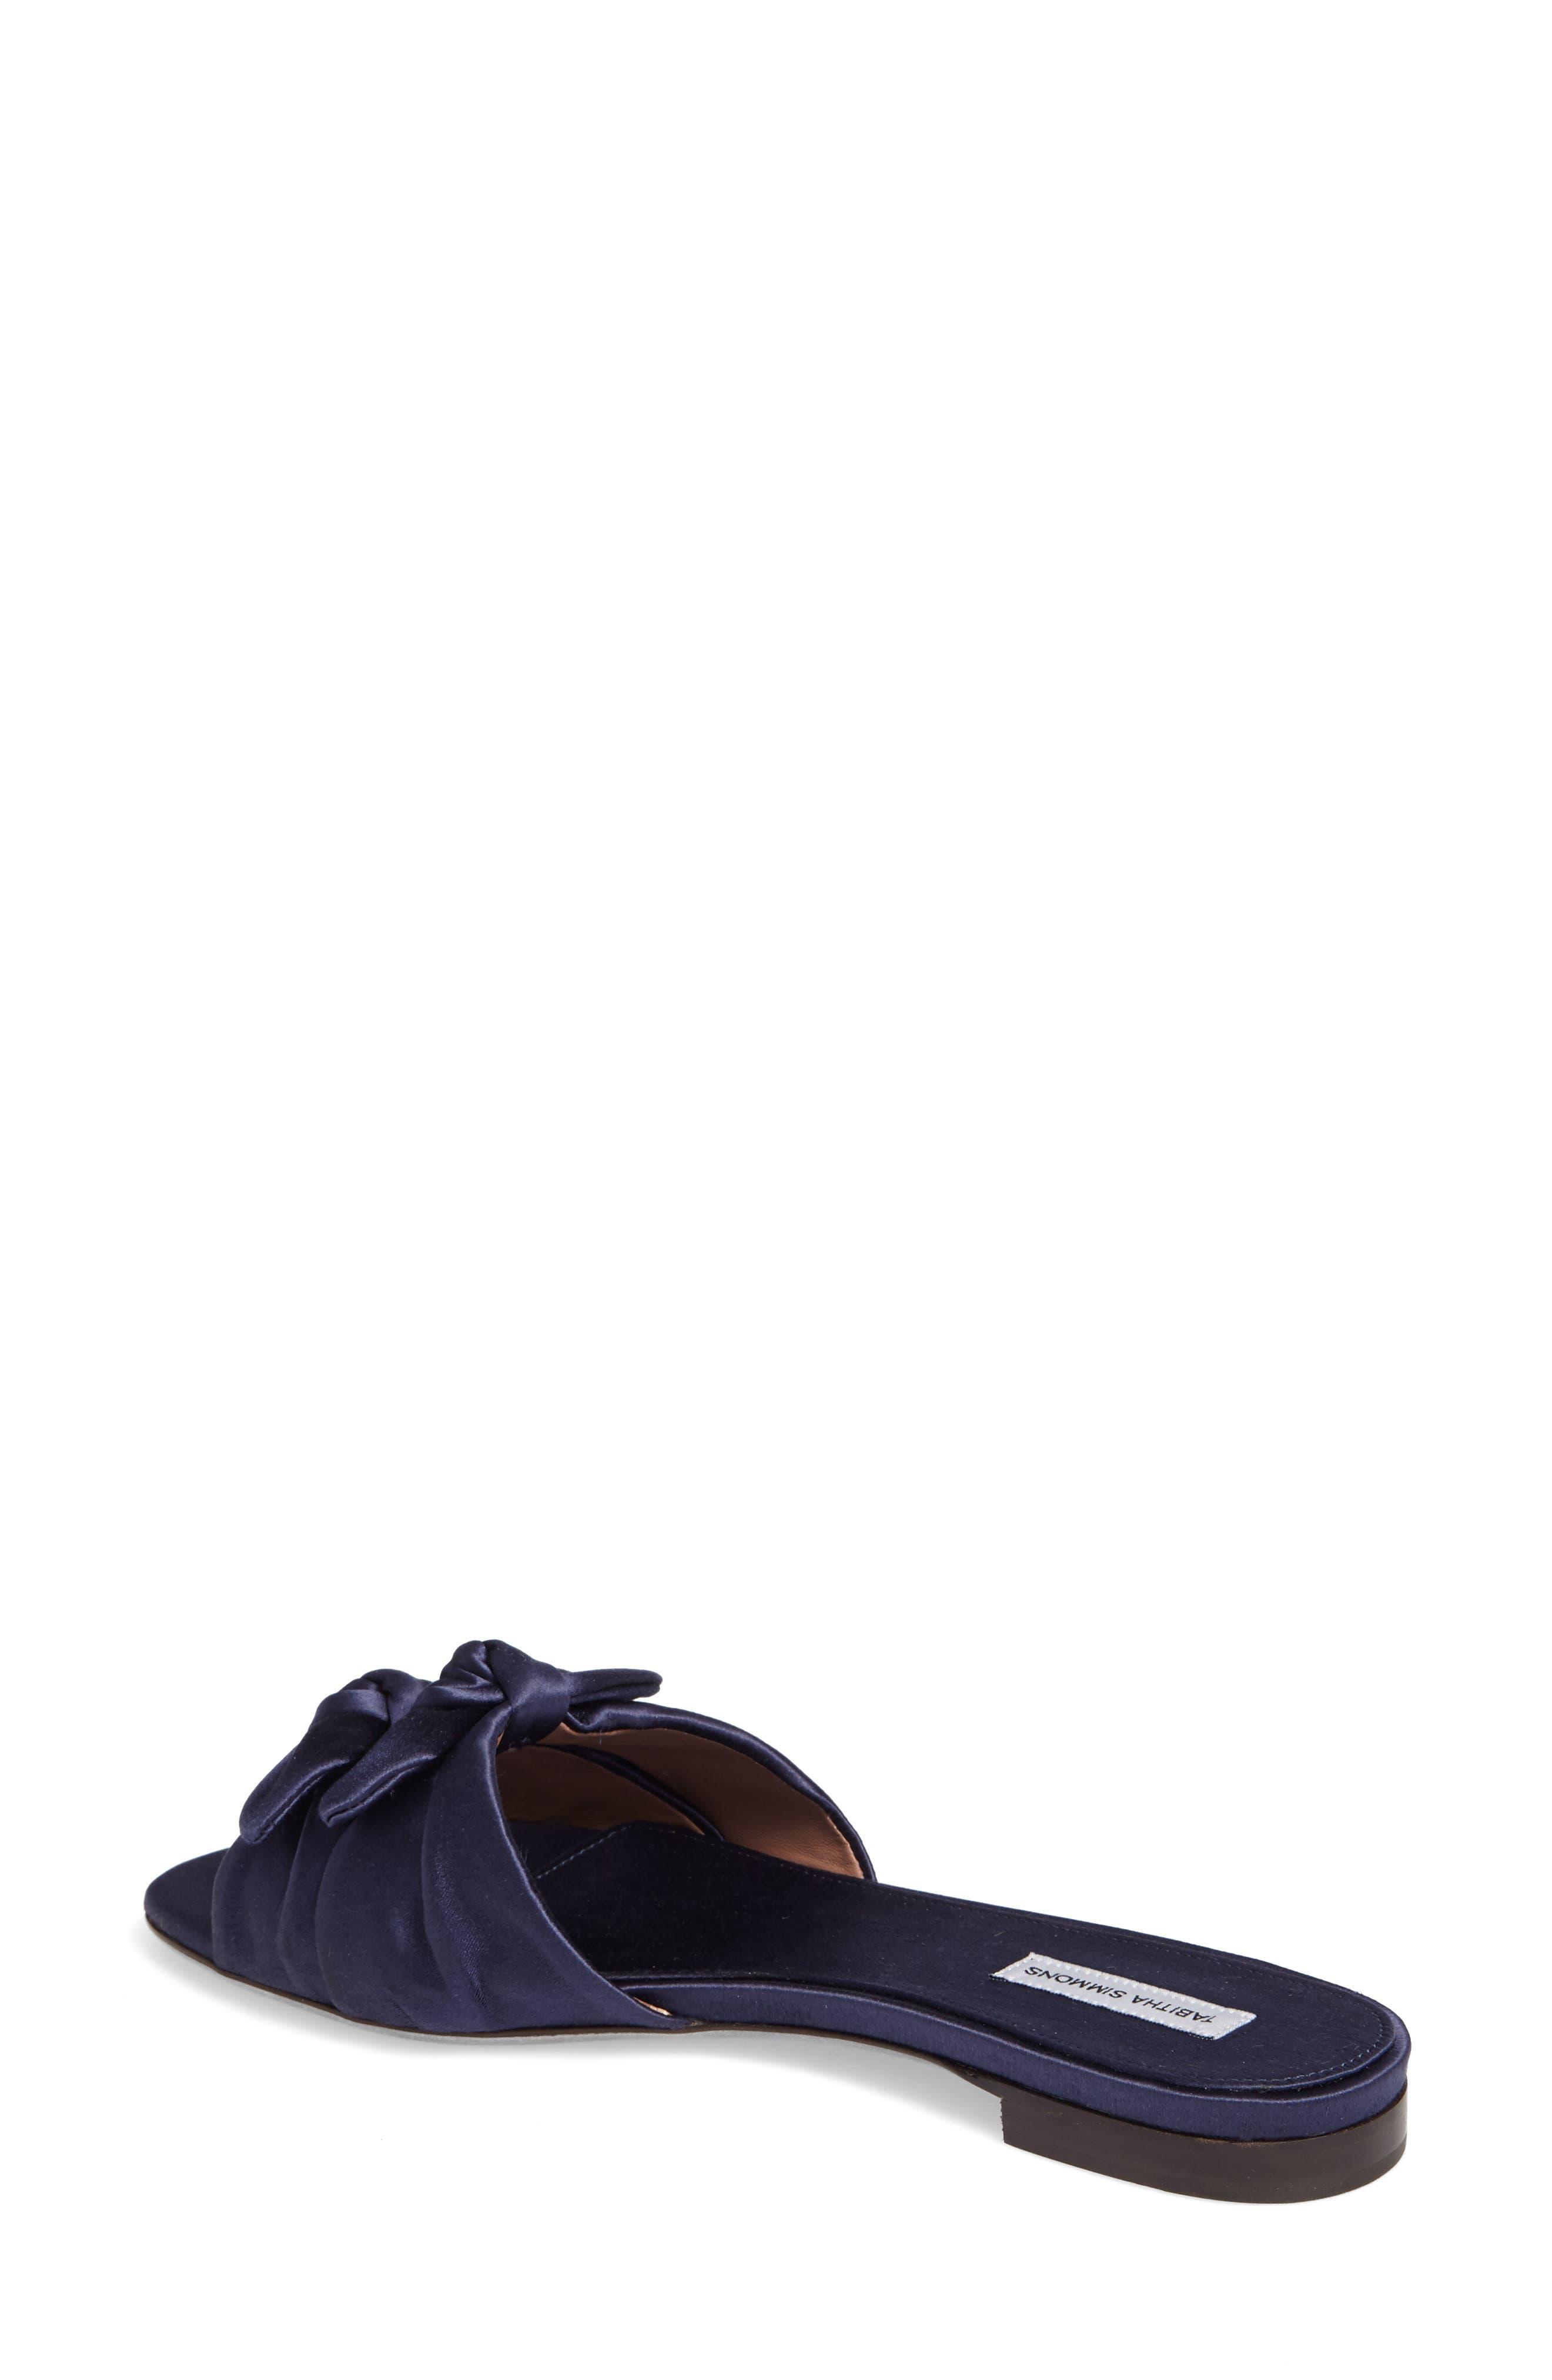 Cleo Knotted Bow Slide Sandal,                             Alternate thumbnail 2, color,                             Navy